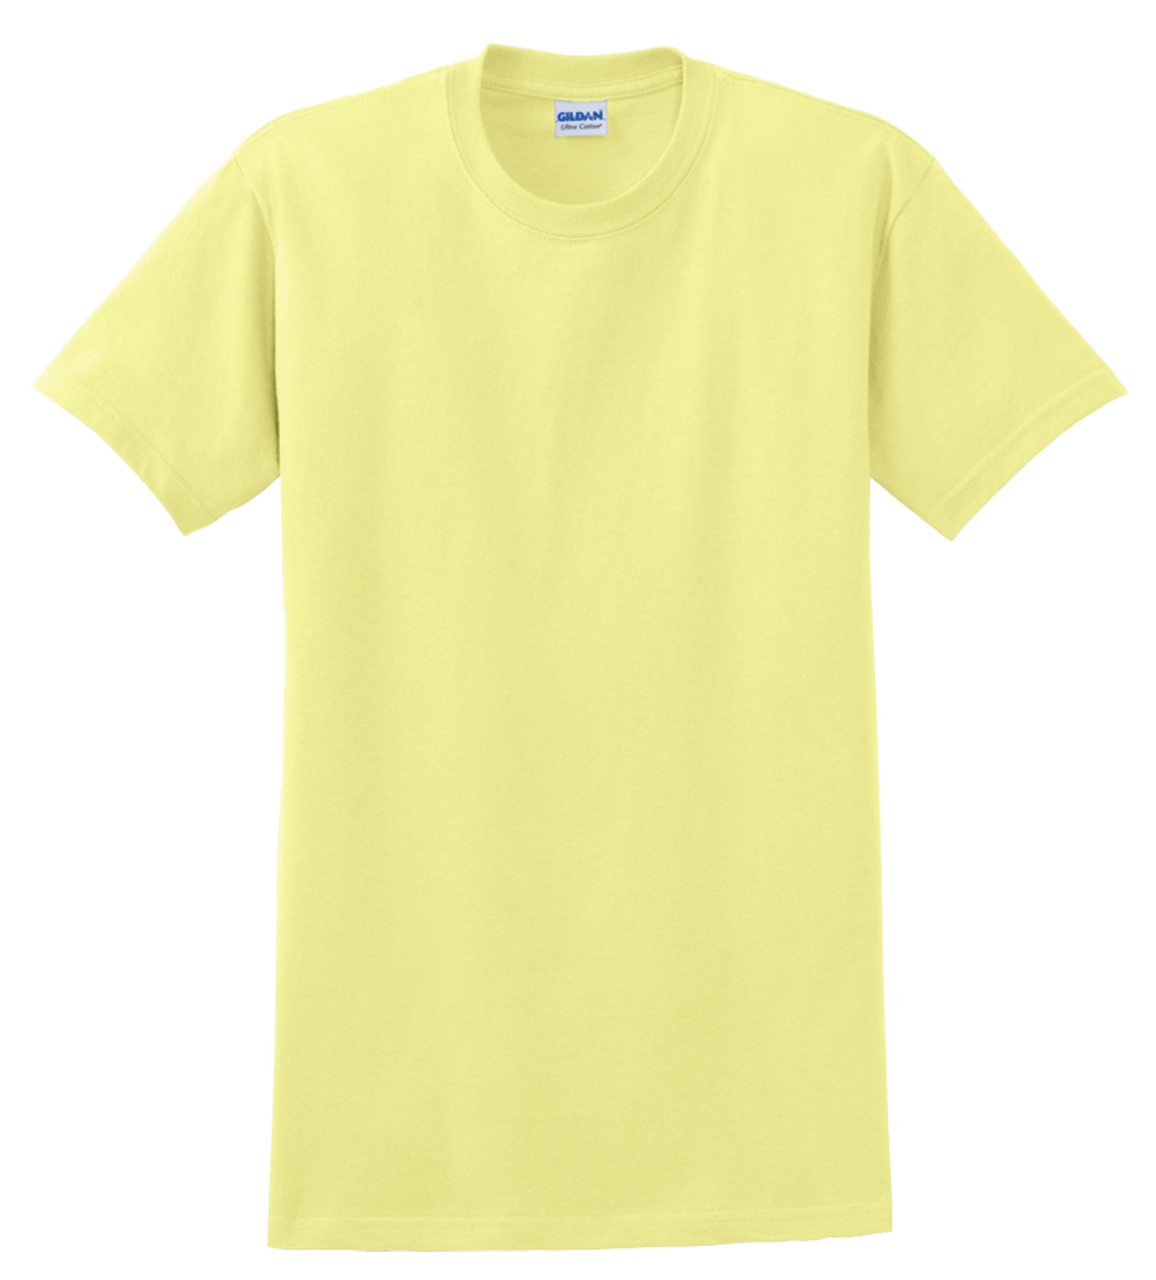 G2000 Citrus Yellow T-Shirt Short Sleeve by Gildan